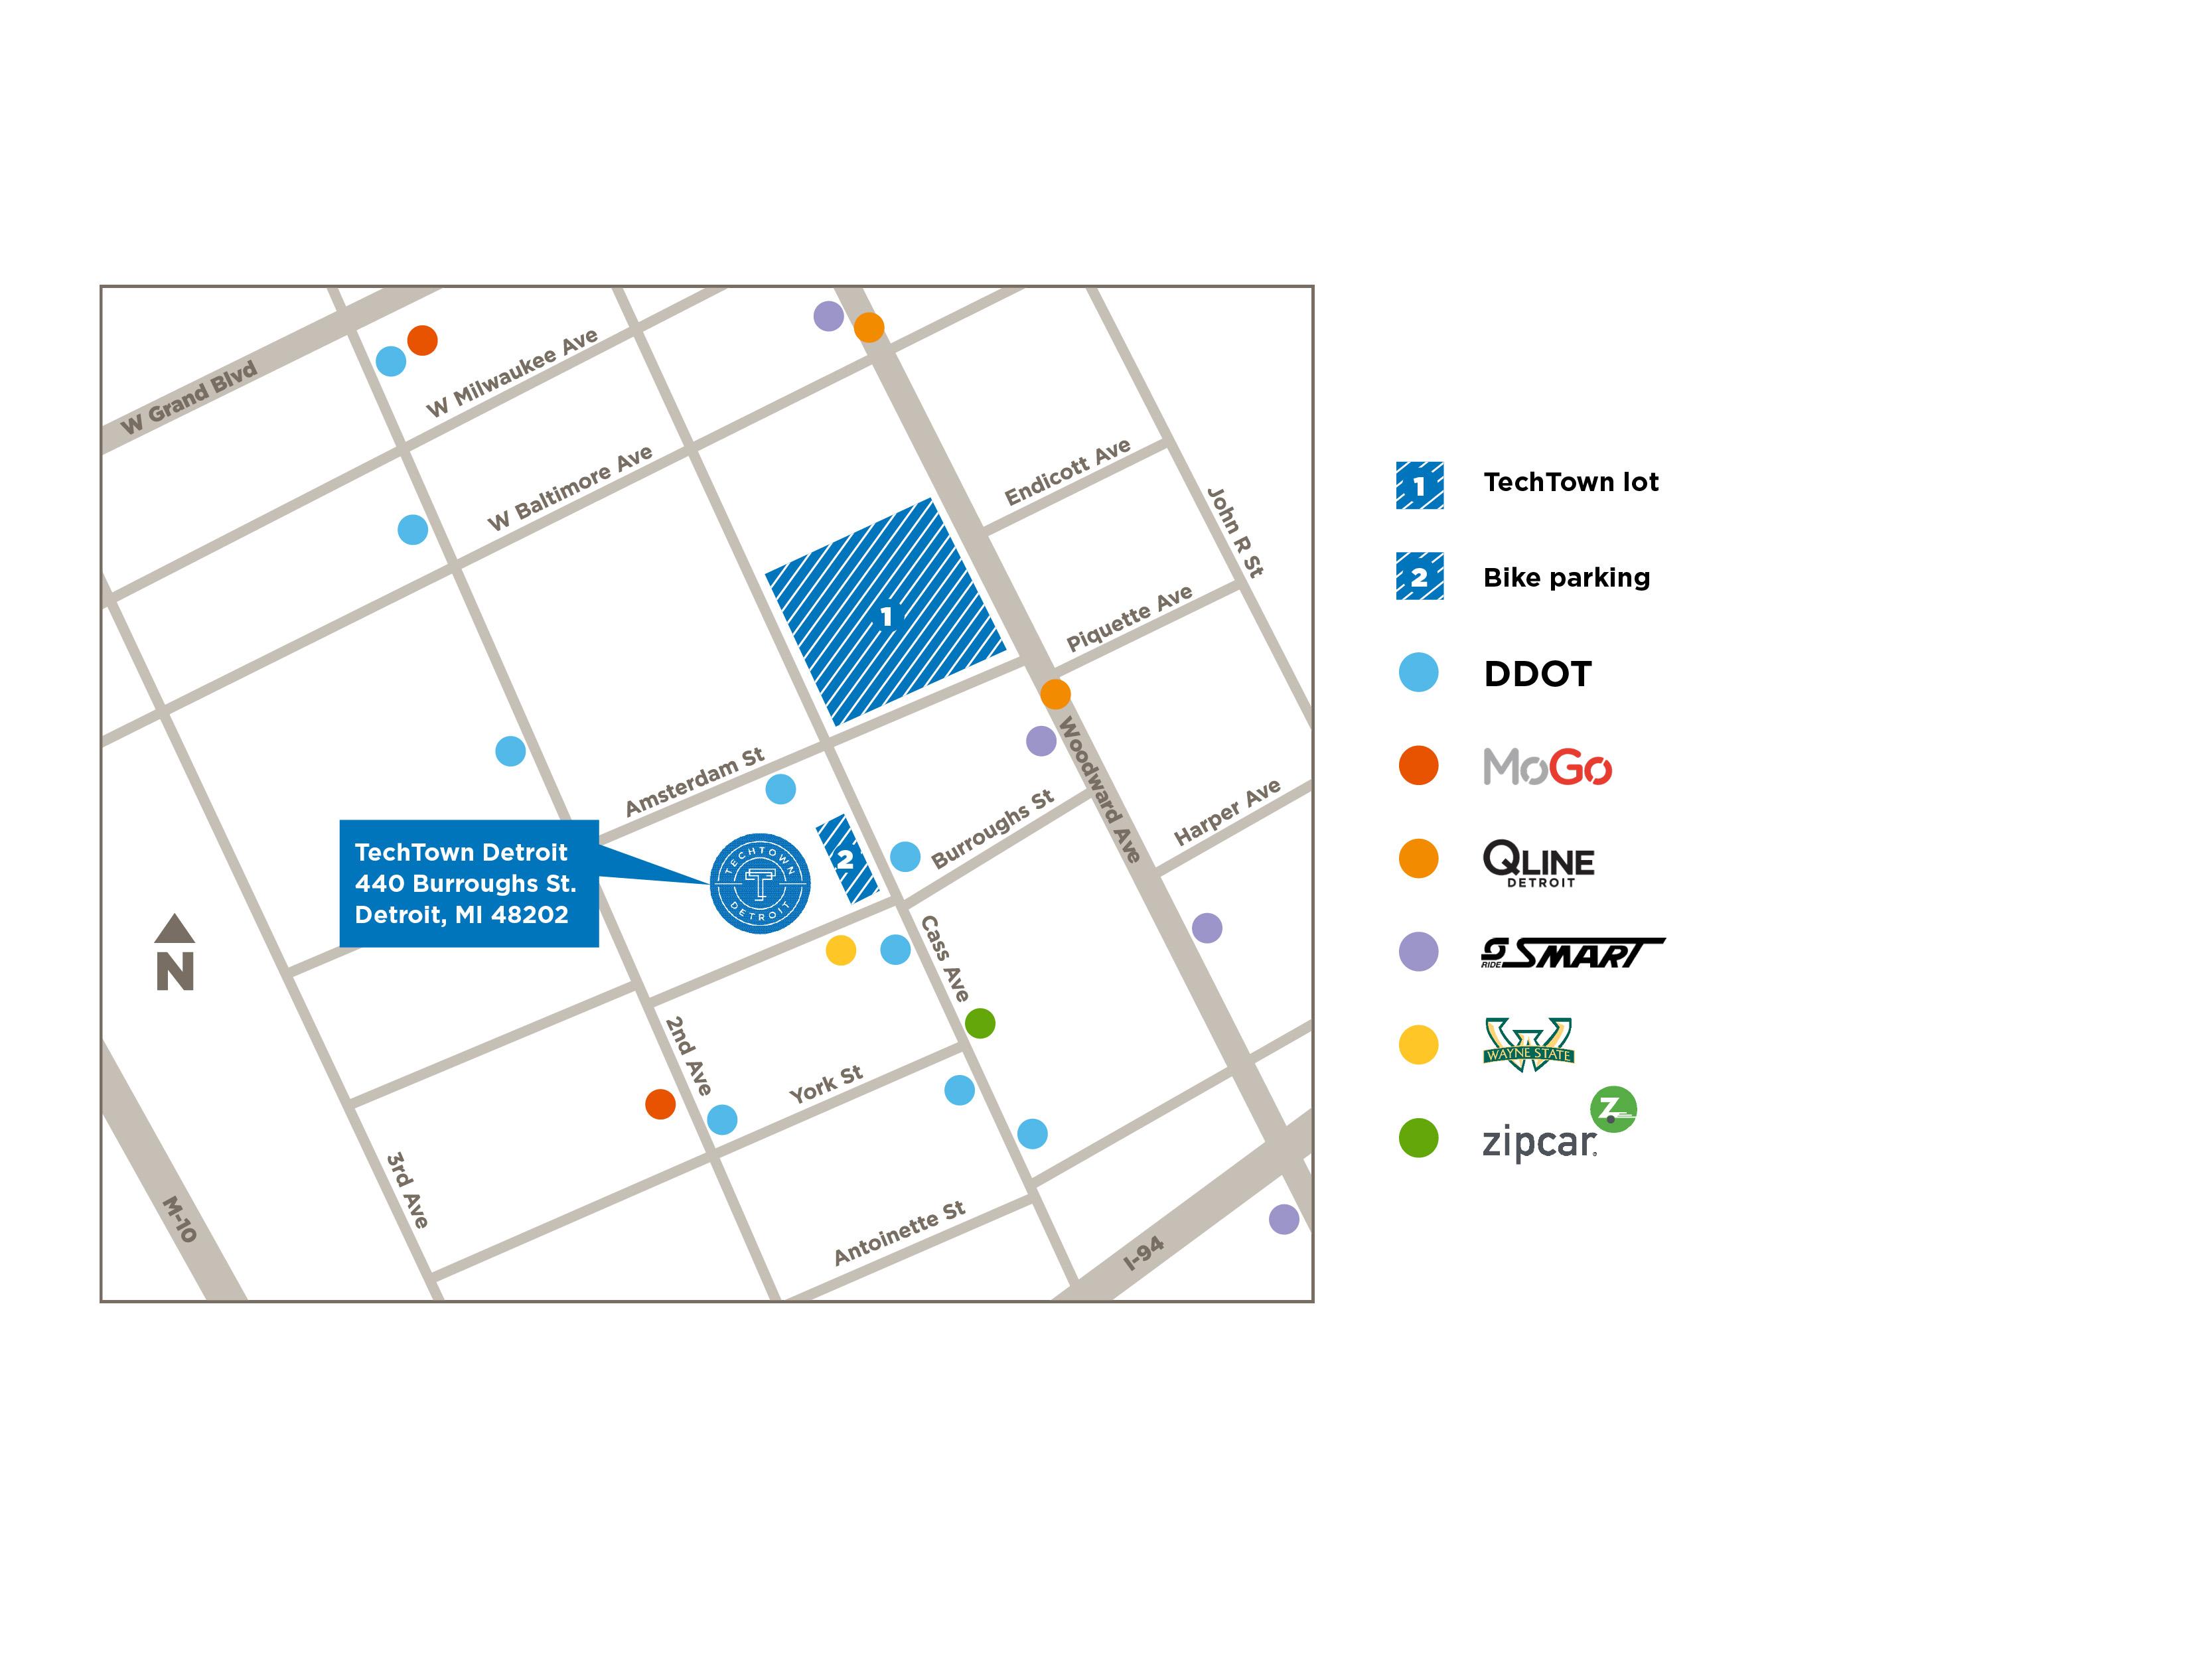 TT_Parking-Transit-Map-Legend_071717.jpg